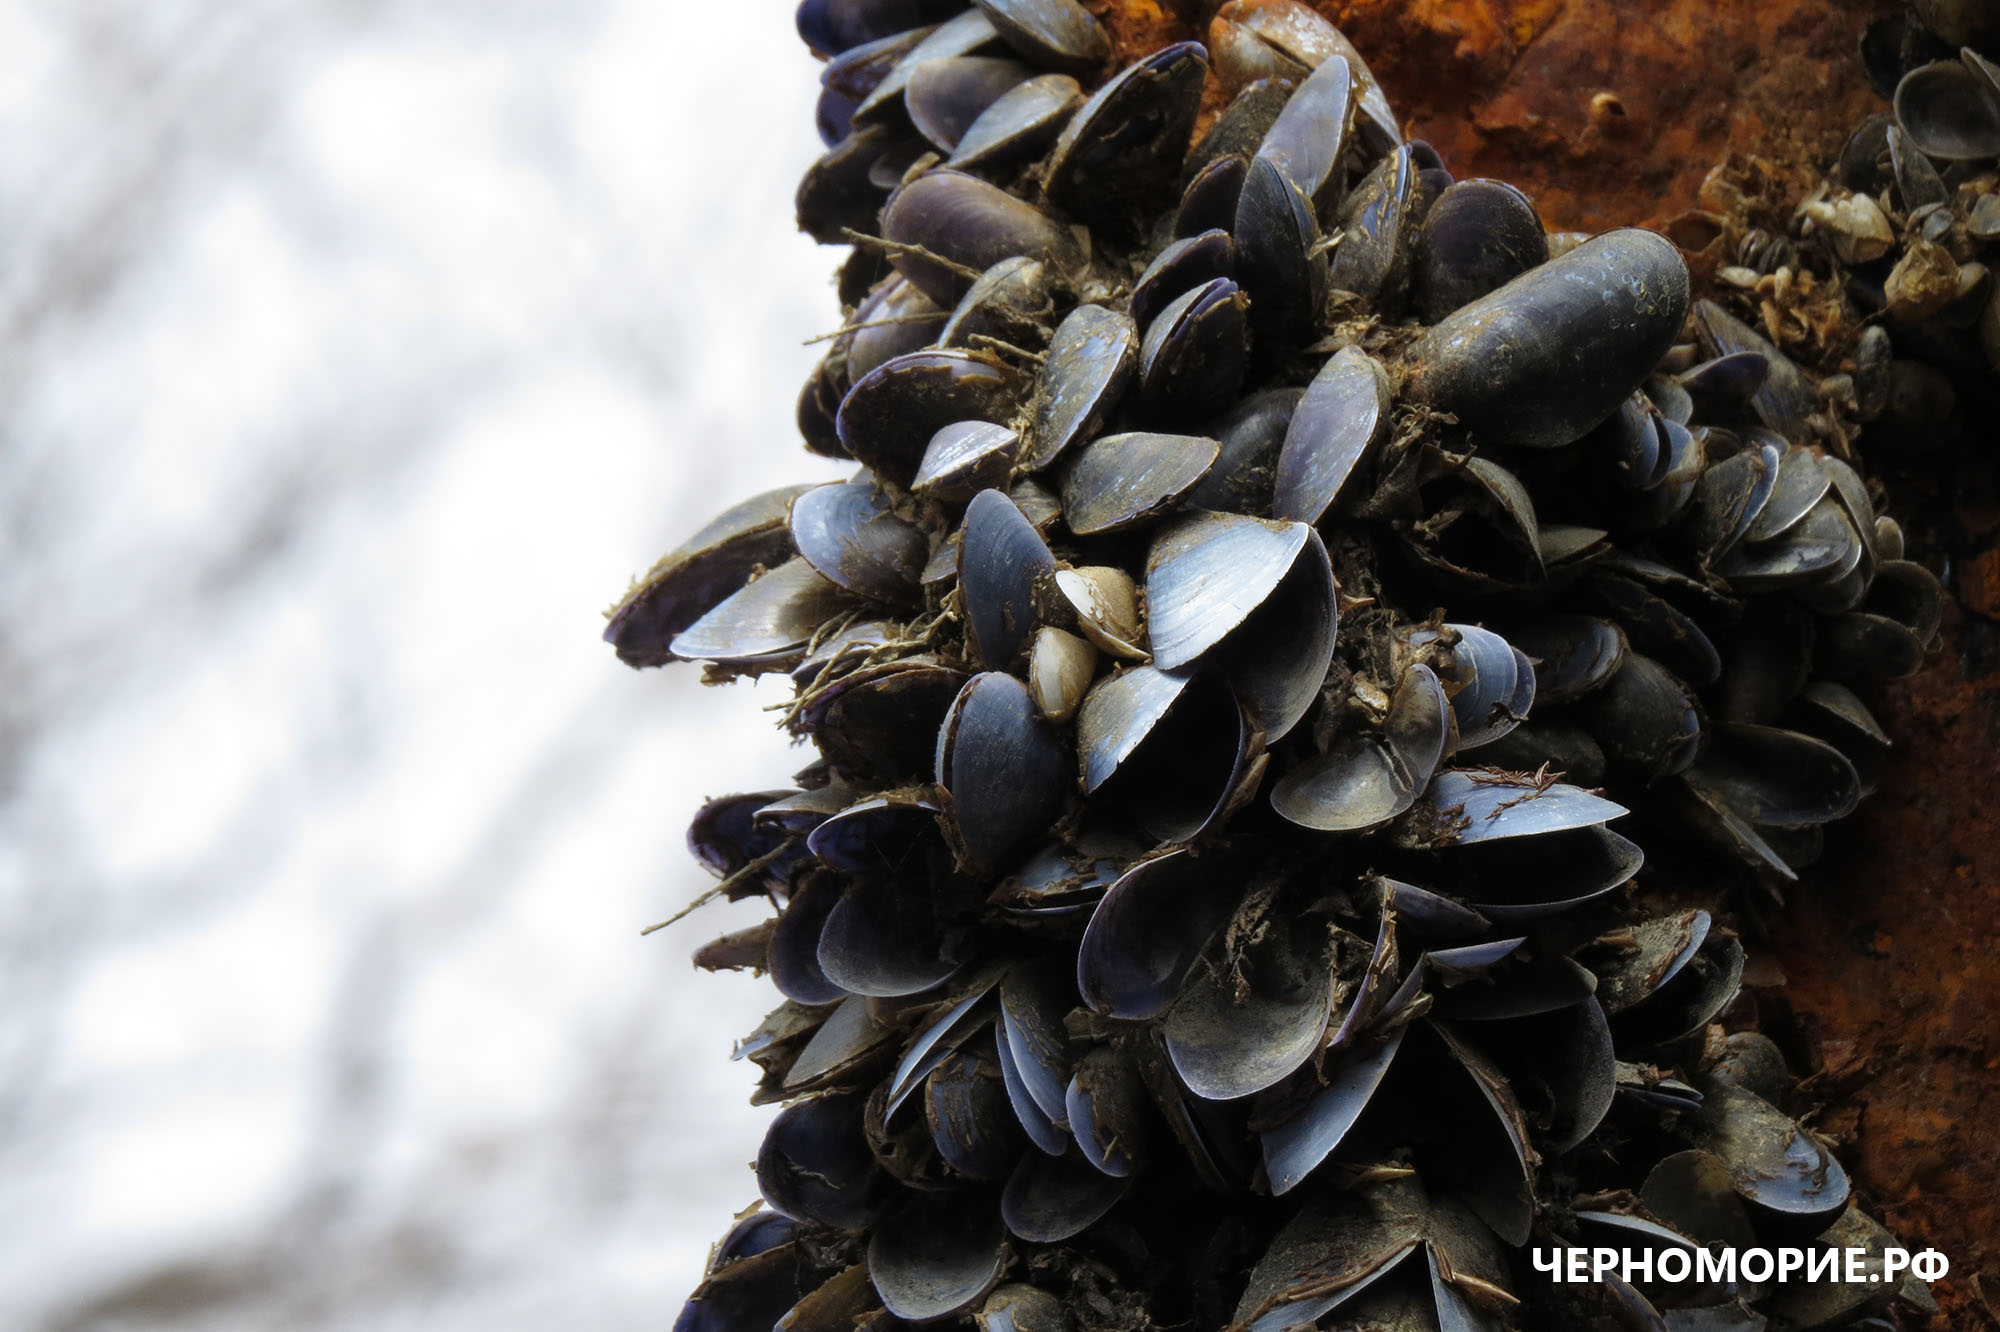 Друз мидии Чёрного моря